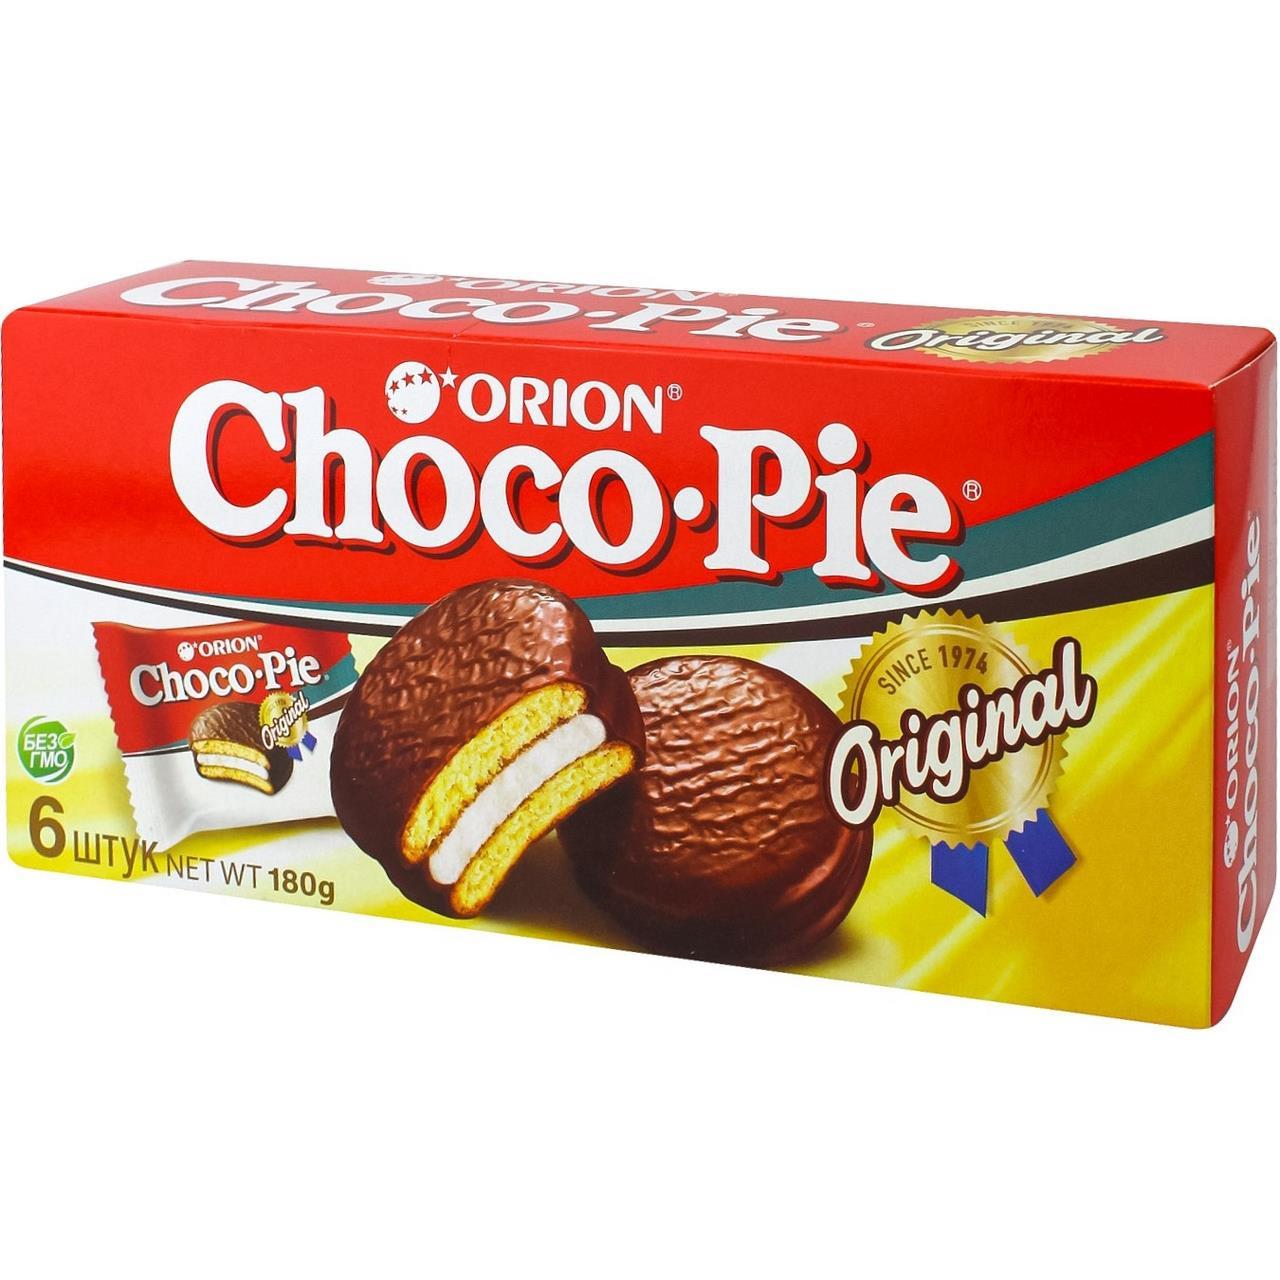 Пирожное ORION Choco-Pie, 180г